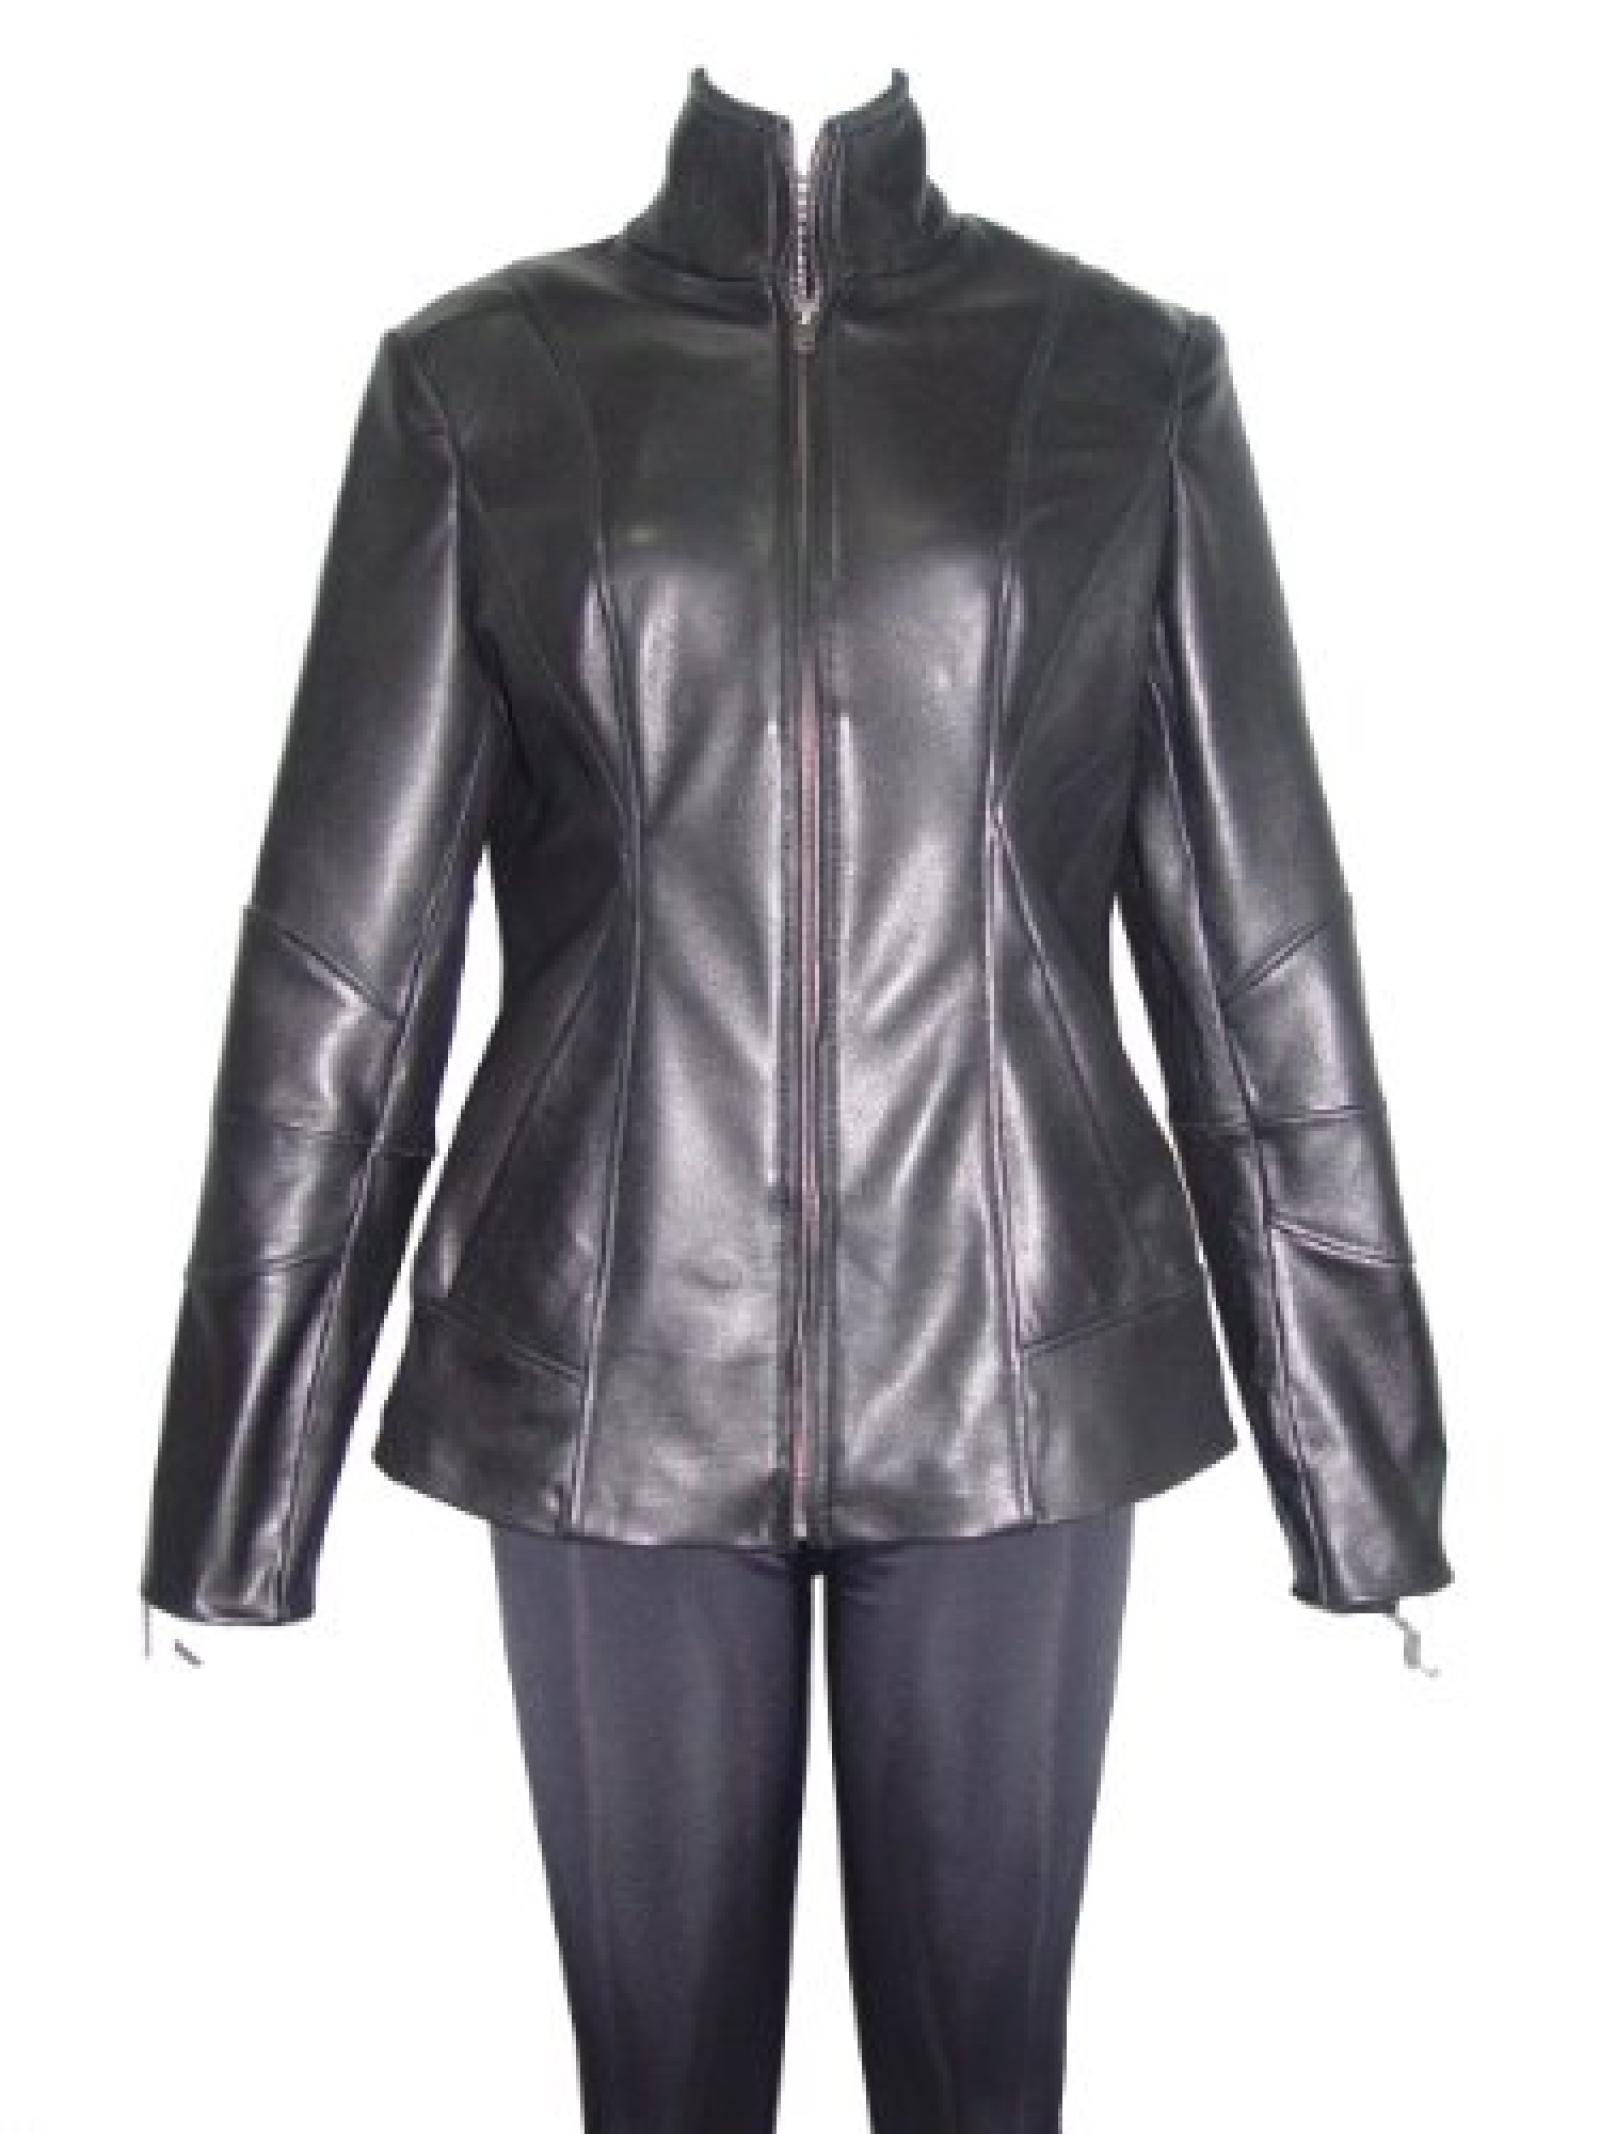 Nettailor FREE tailoring Women PETITE SZ 4201 Leather Moto Jacket